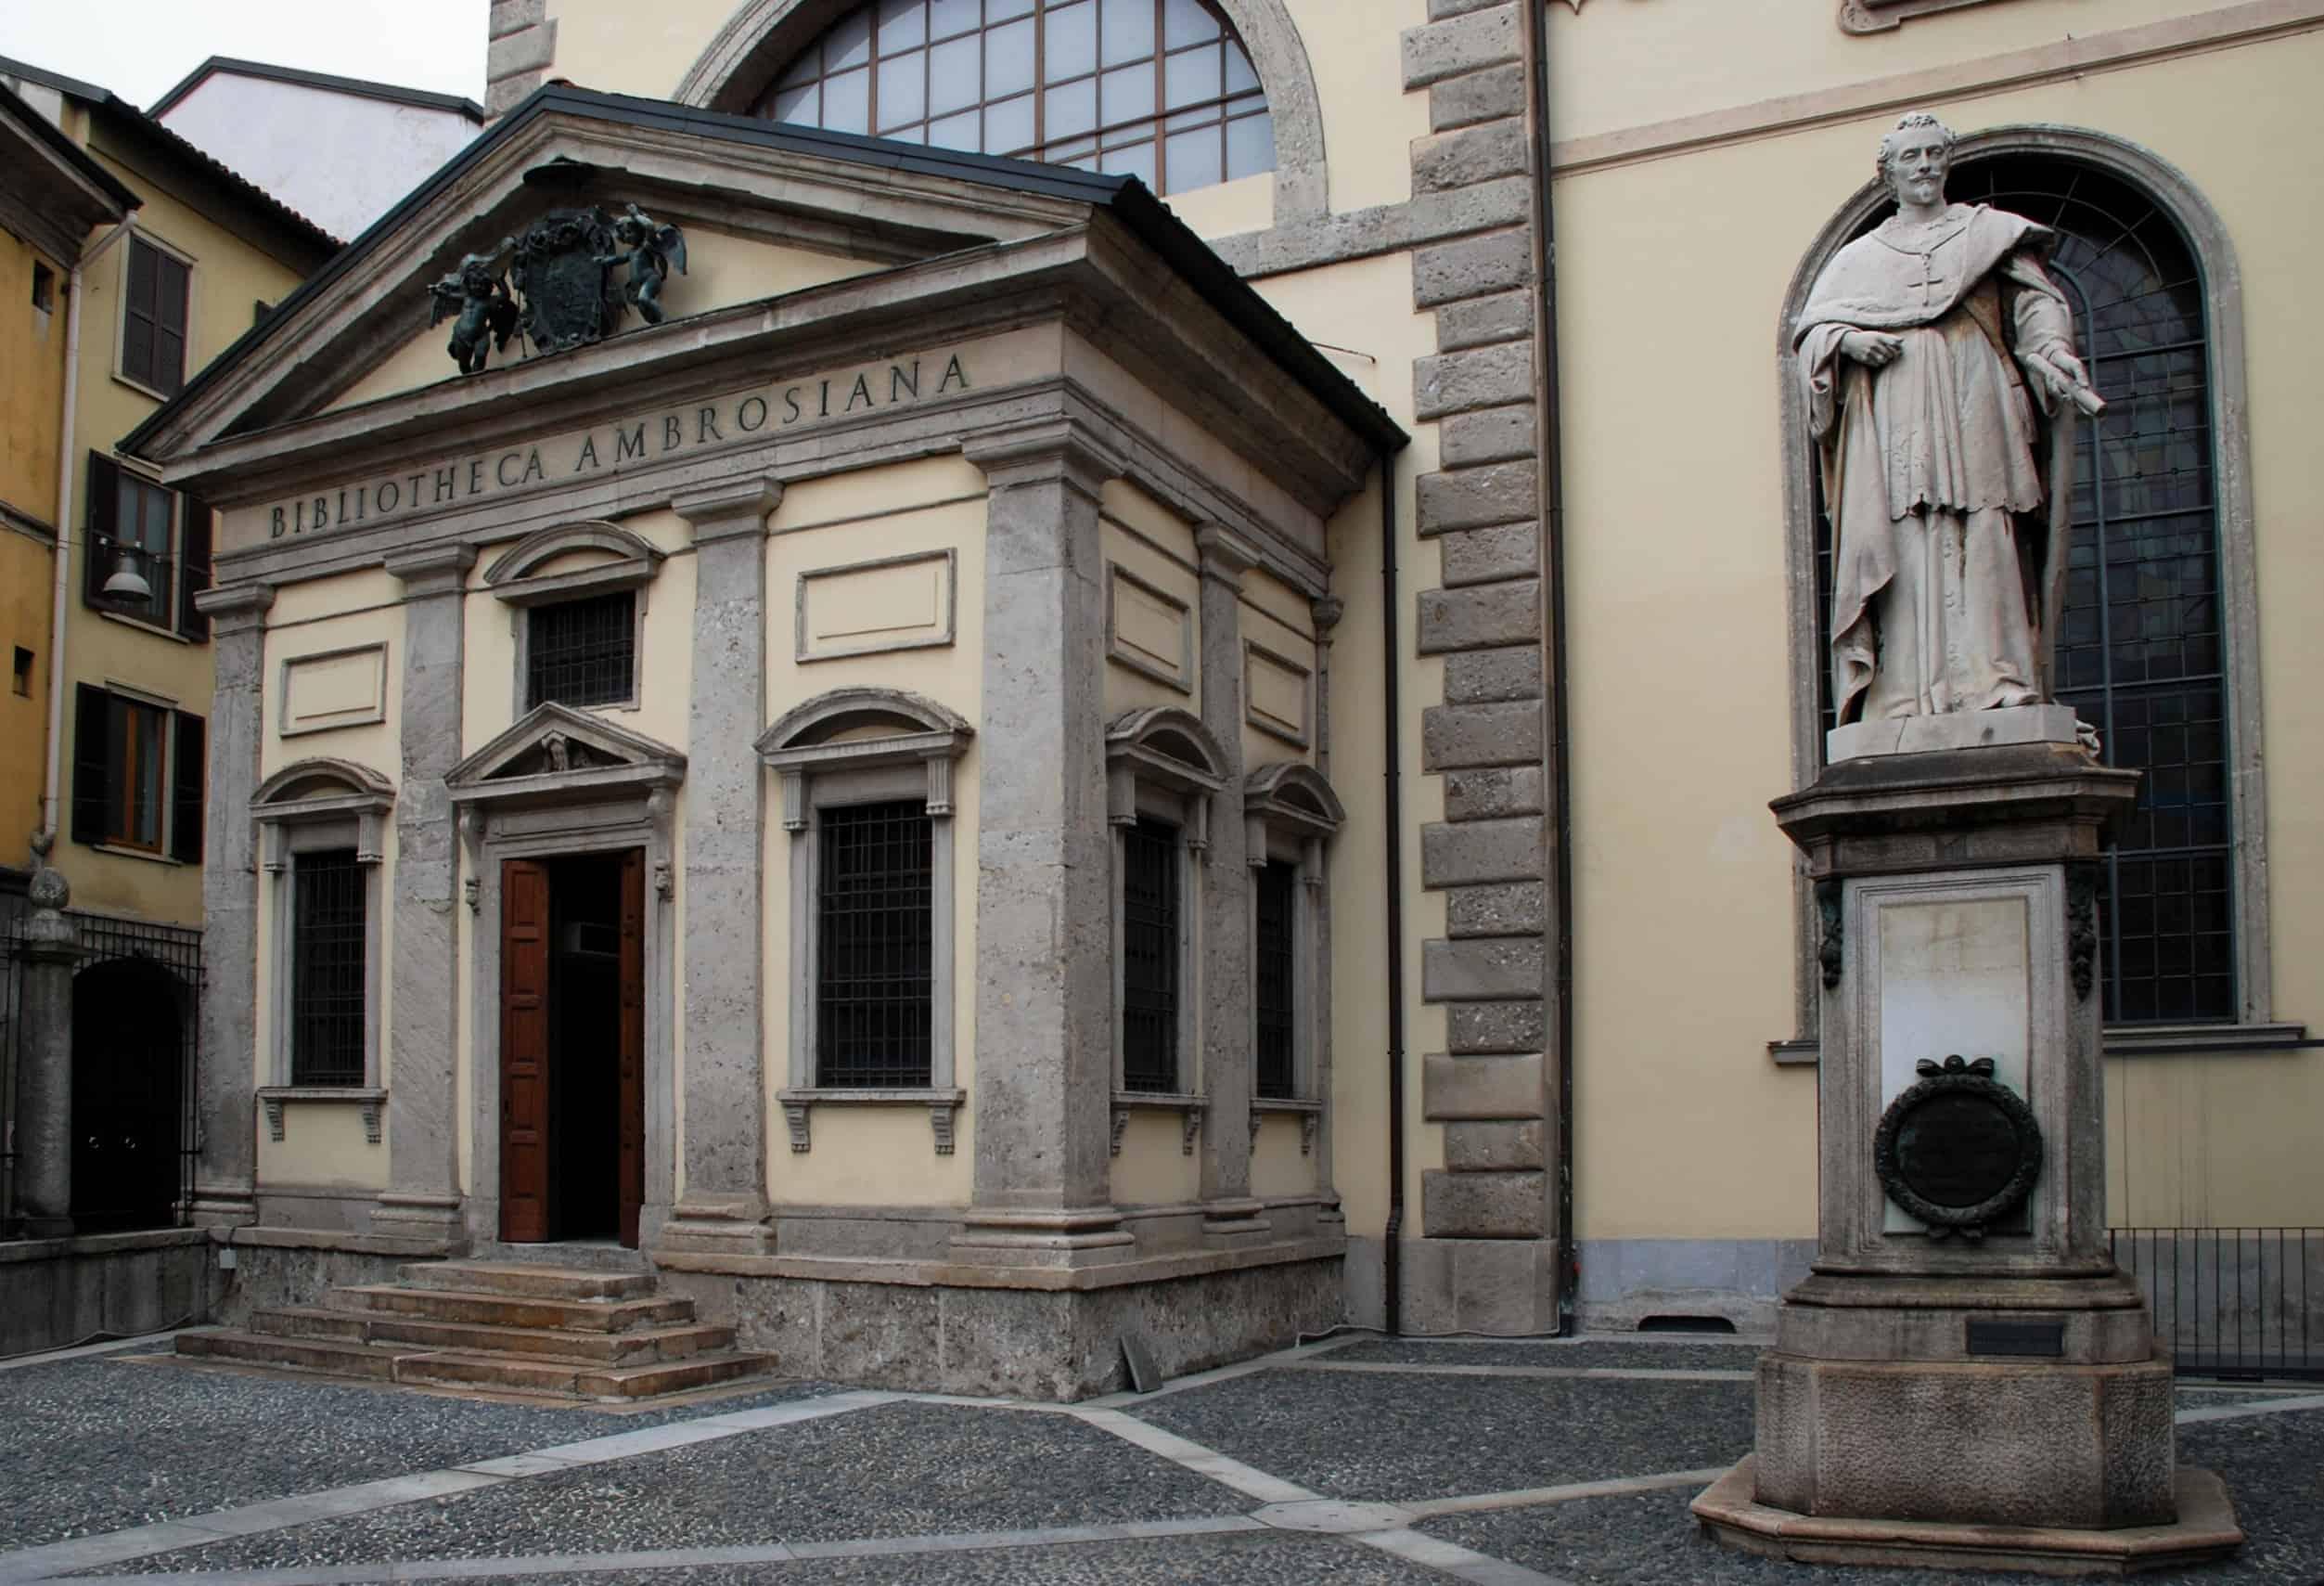 Biblioteca and Pinacoteca Ambrosiana